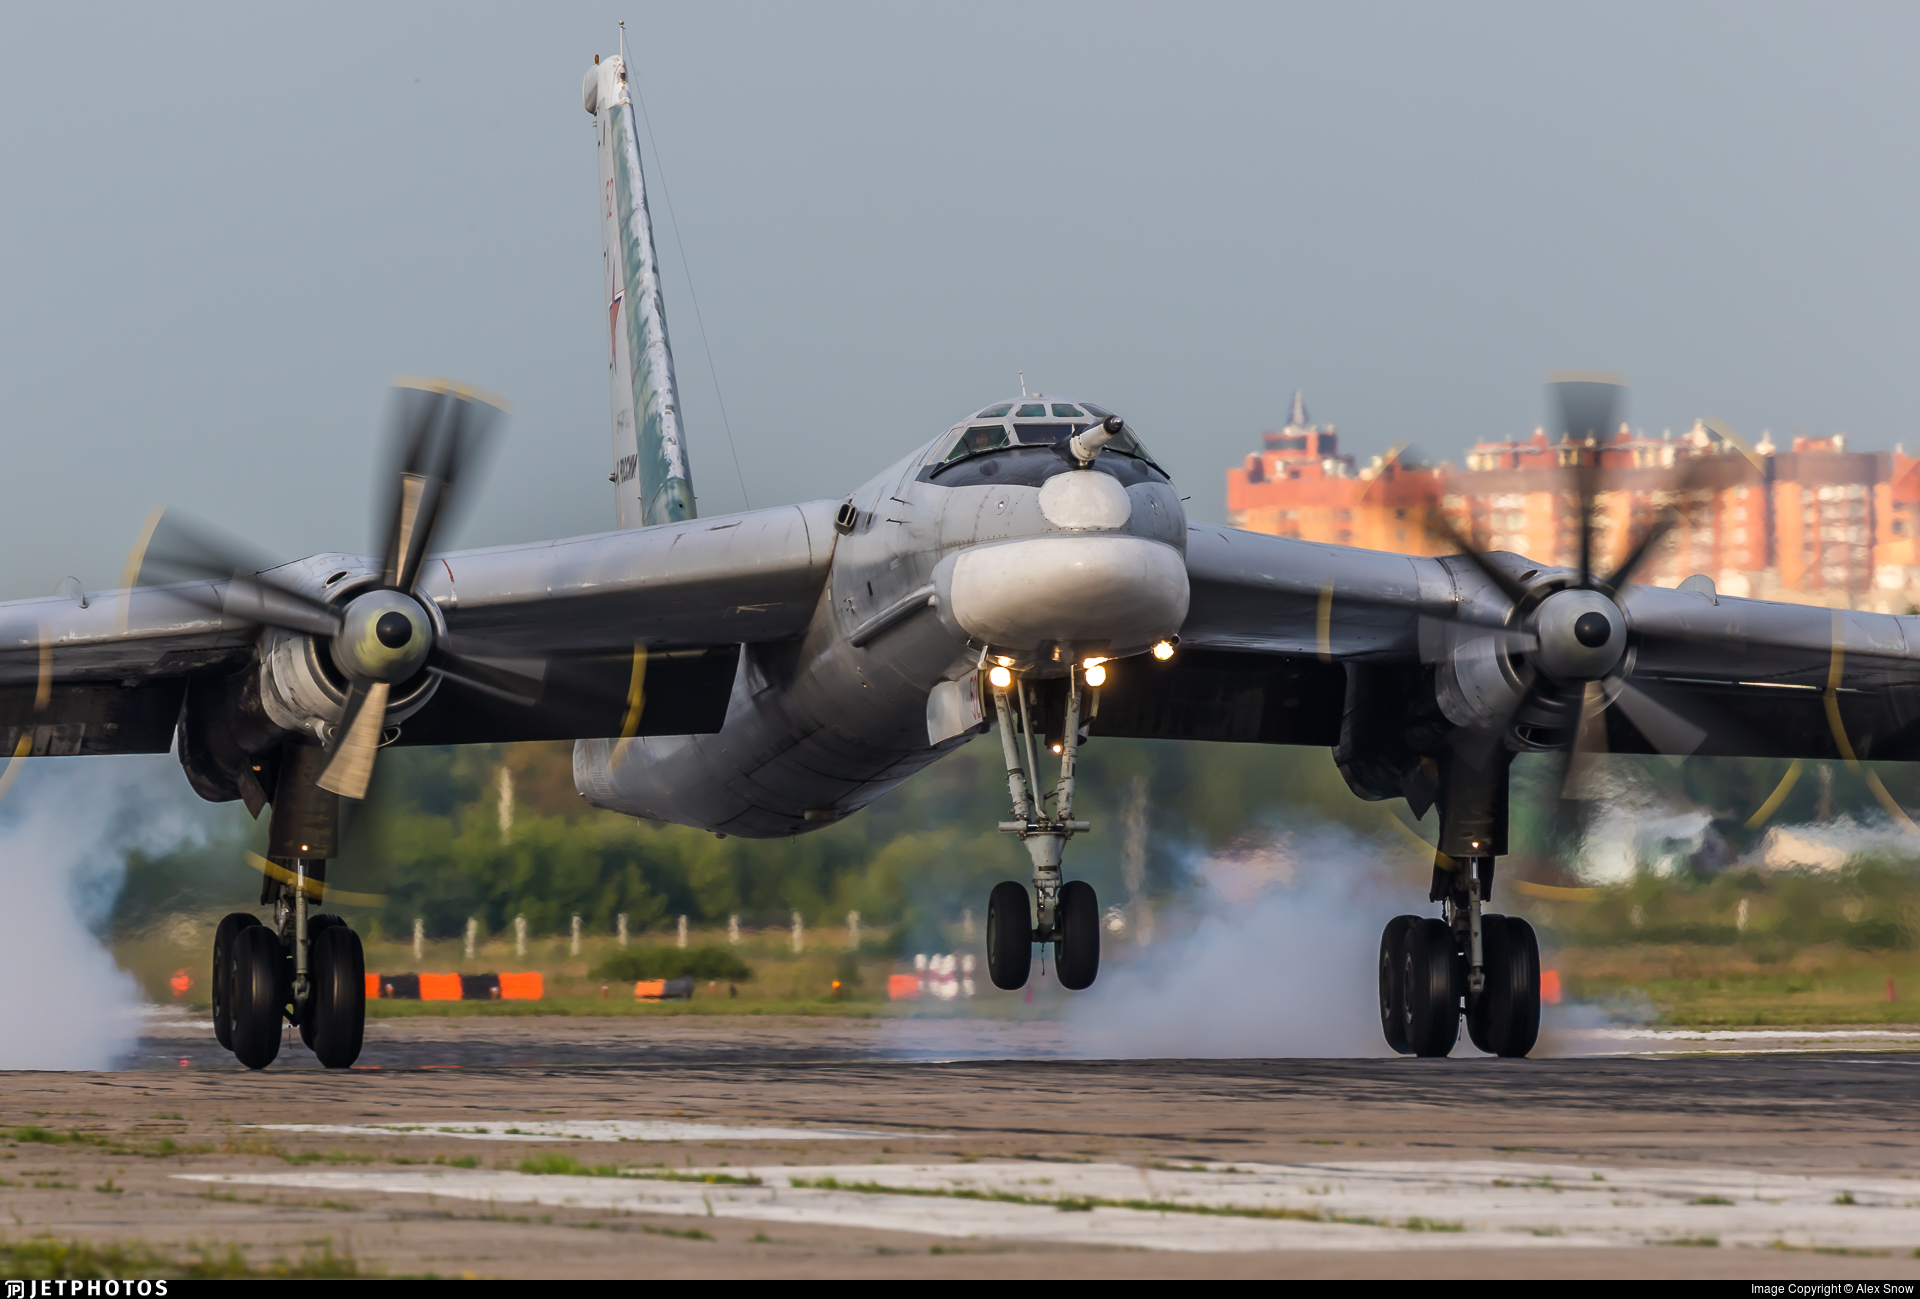 RF-94194 - Tupolev Tu-95MS Bear-H - Russia - Air Force